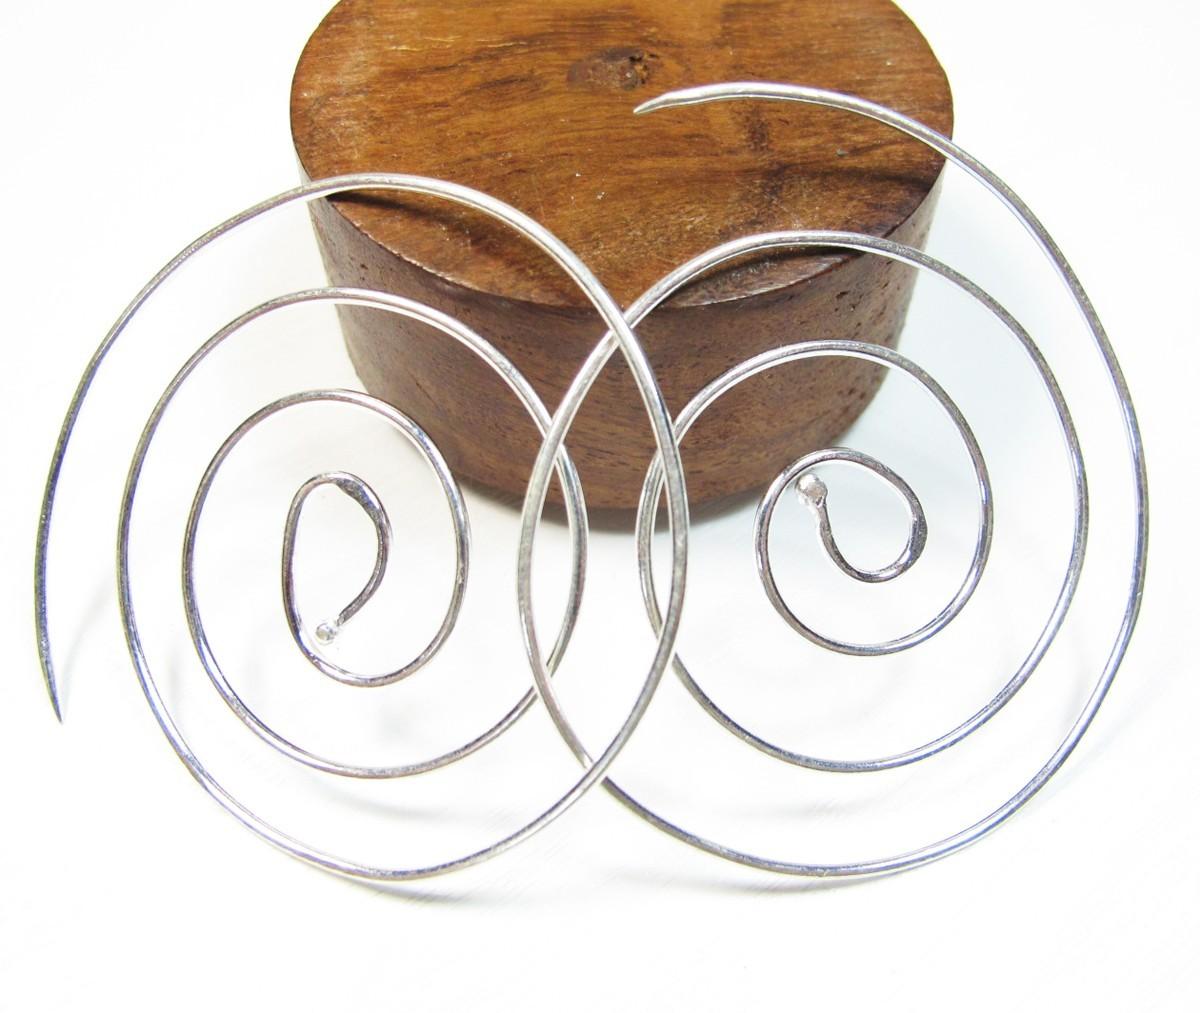 boucle d 39 oreille argent spirale bijou argent original. Black Bedroom Furniture Sets. Home Design Ideas